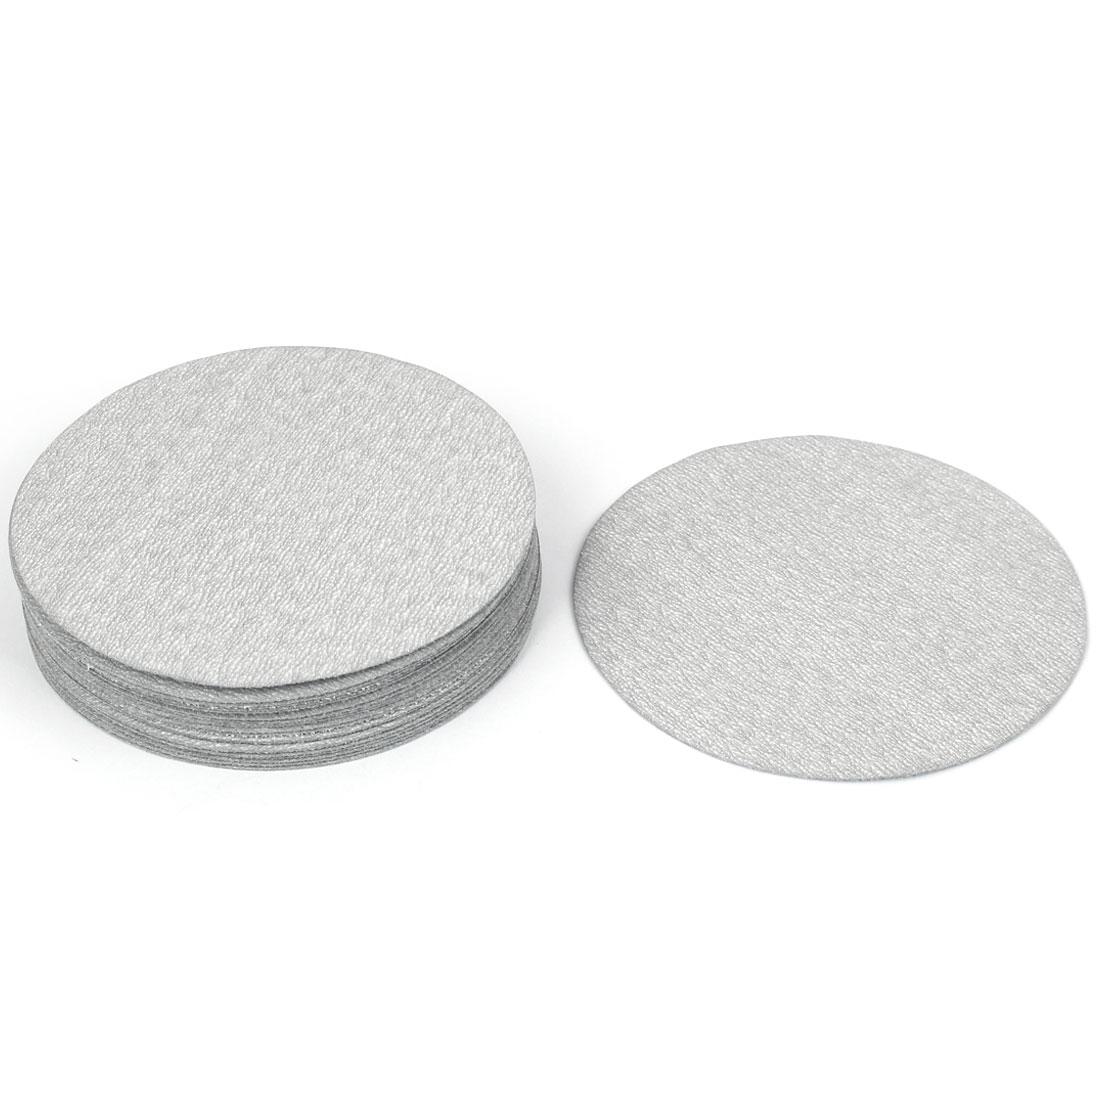 "Grinding Tool 1000 Grit Sanding Disc Flocking Sandpaper 5"" Dia 20pcs"